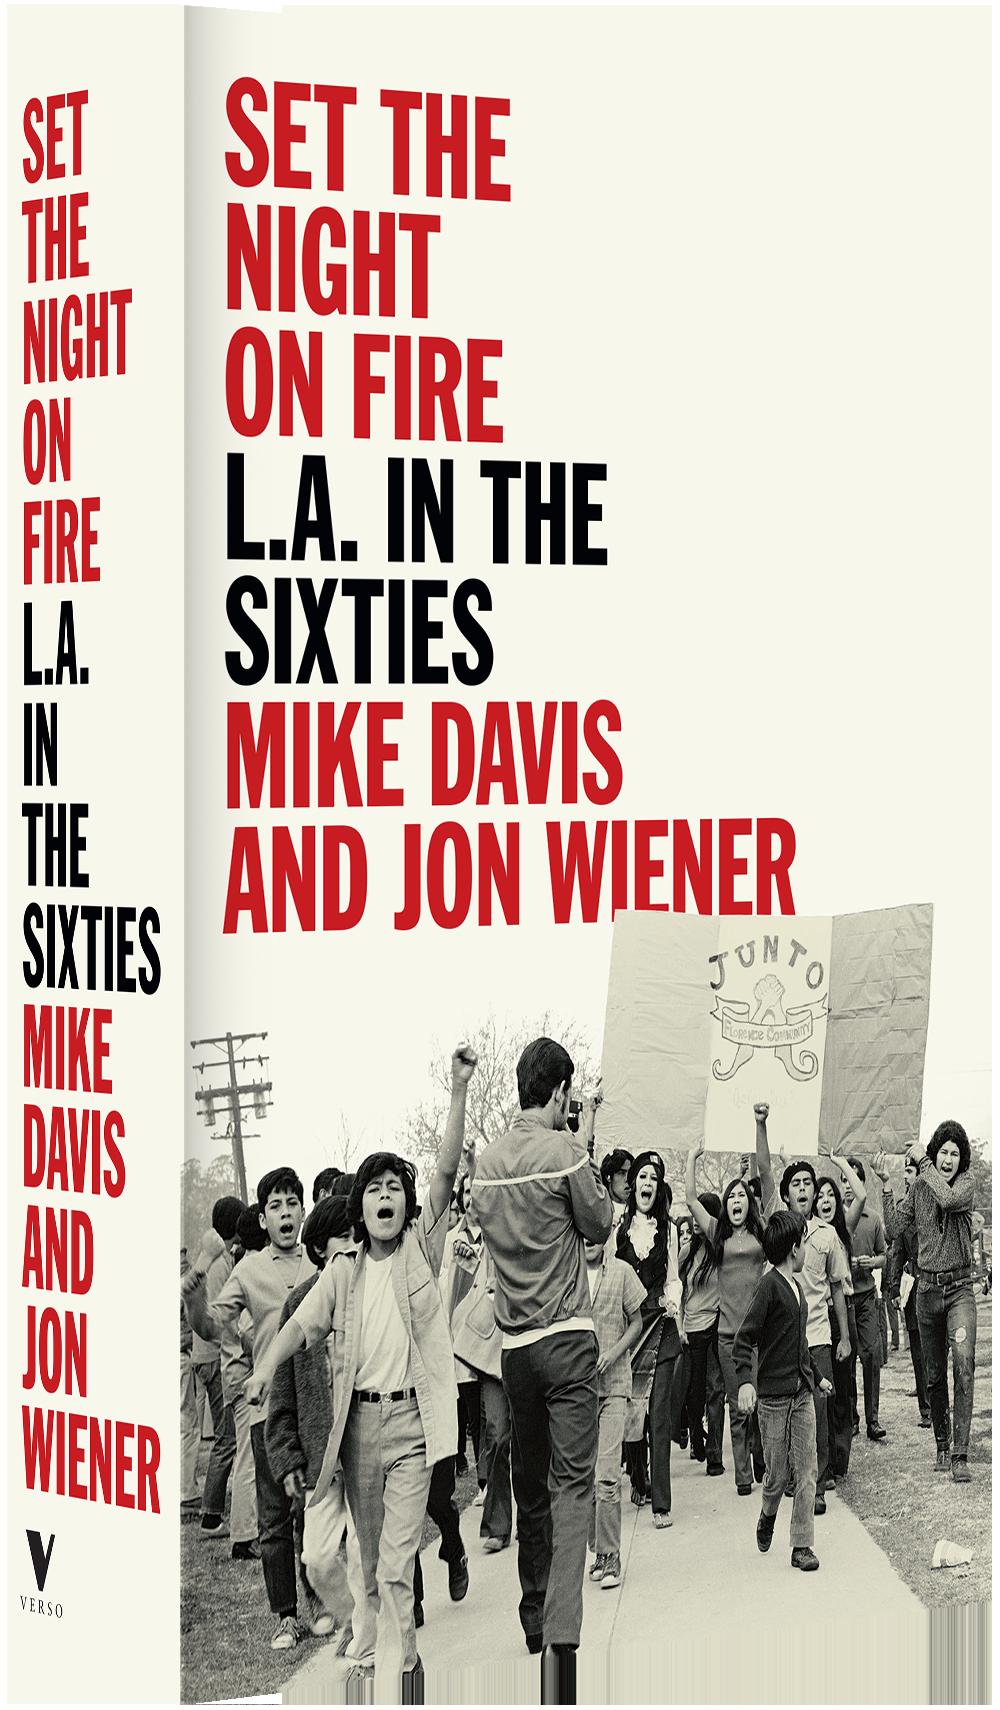 Set-the-night-on-fire-pb